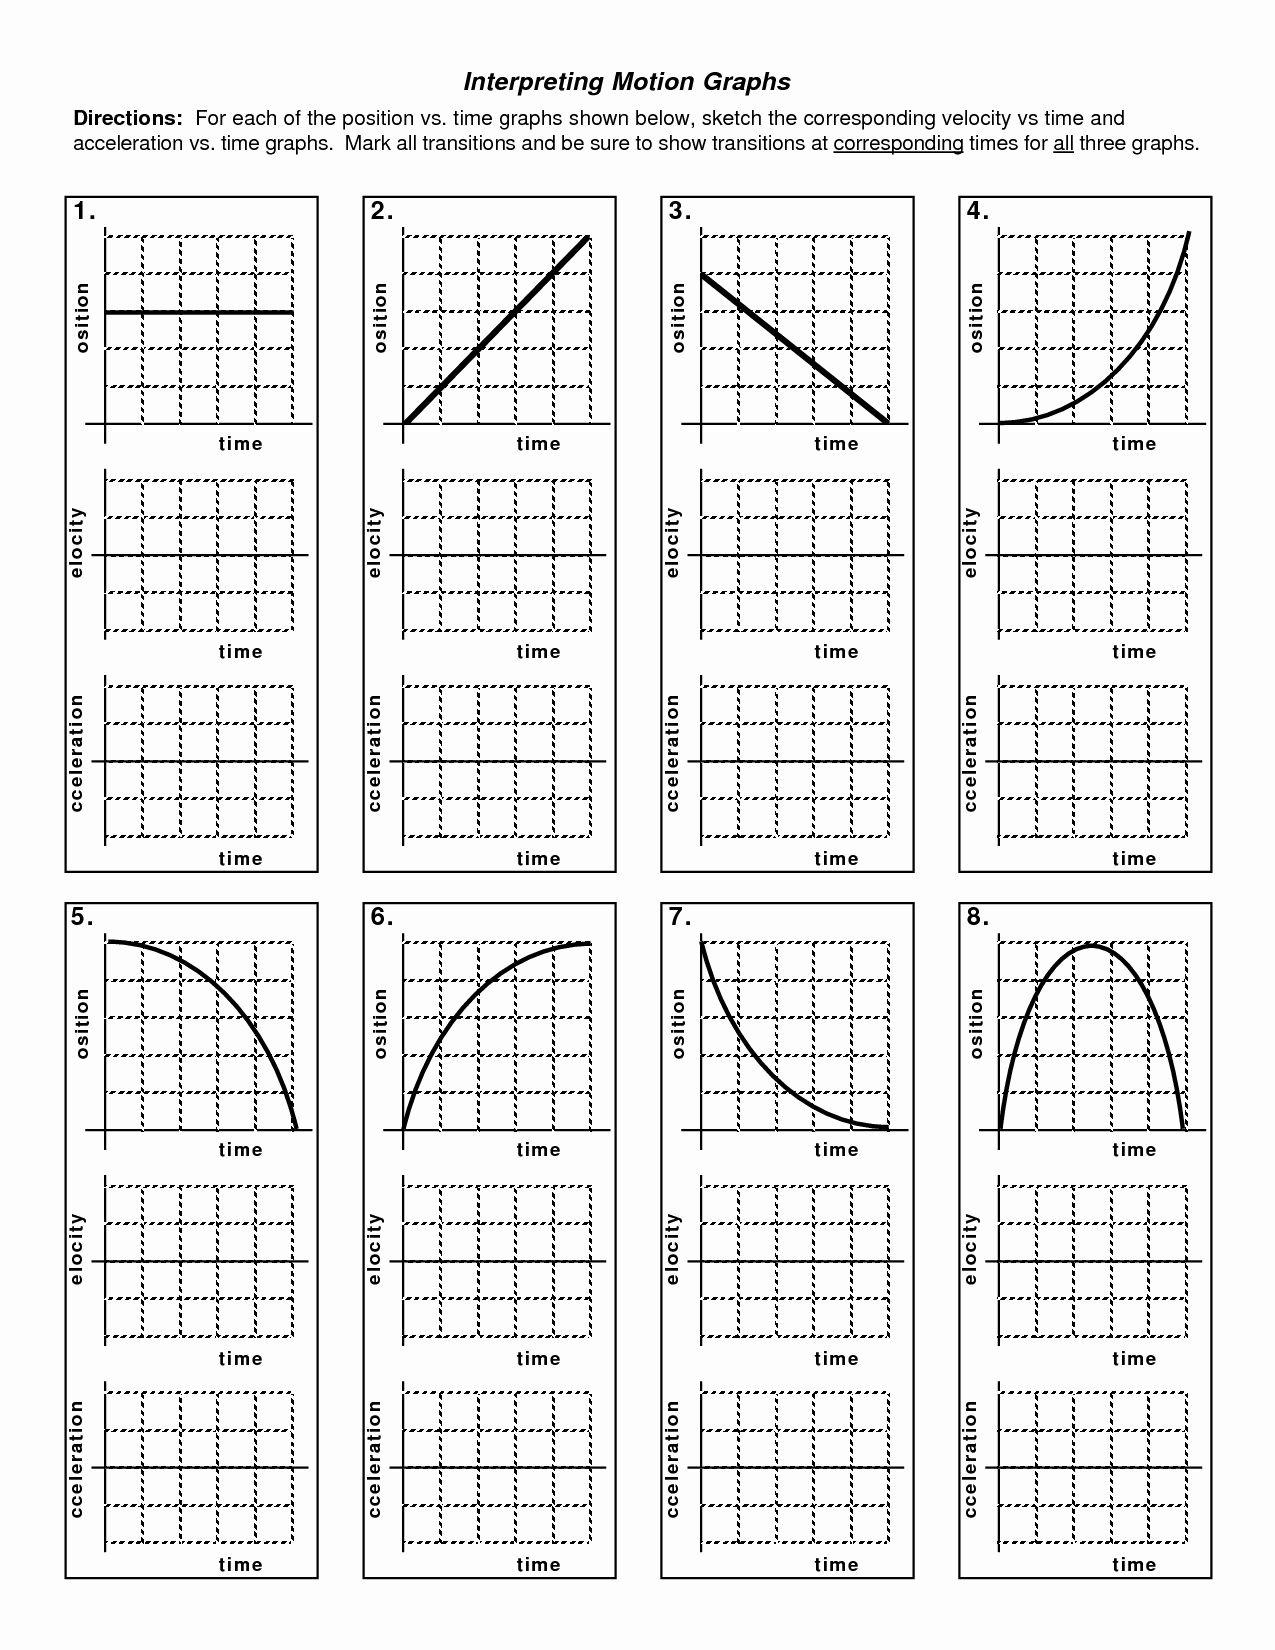 Motion Graphs Worksheet Answers Luxury Kinematics Motion